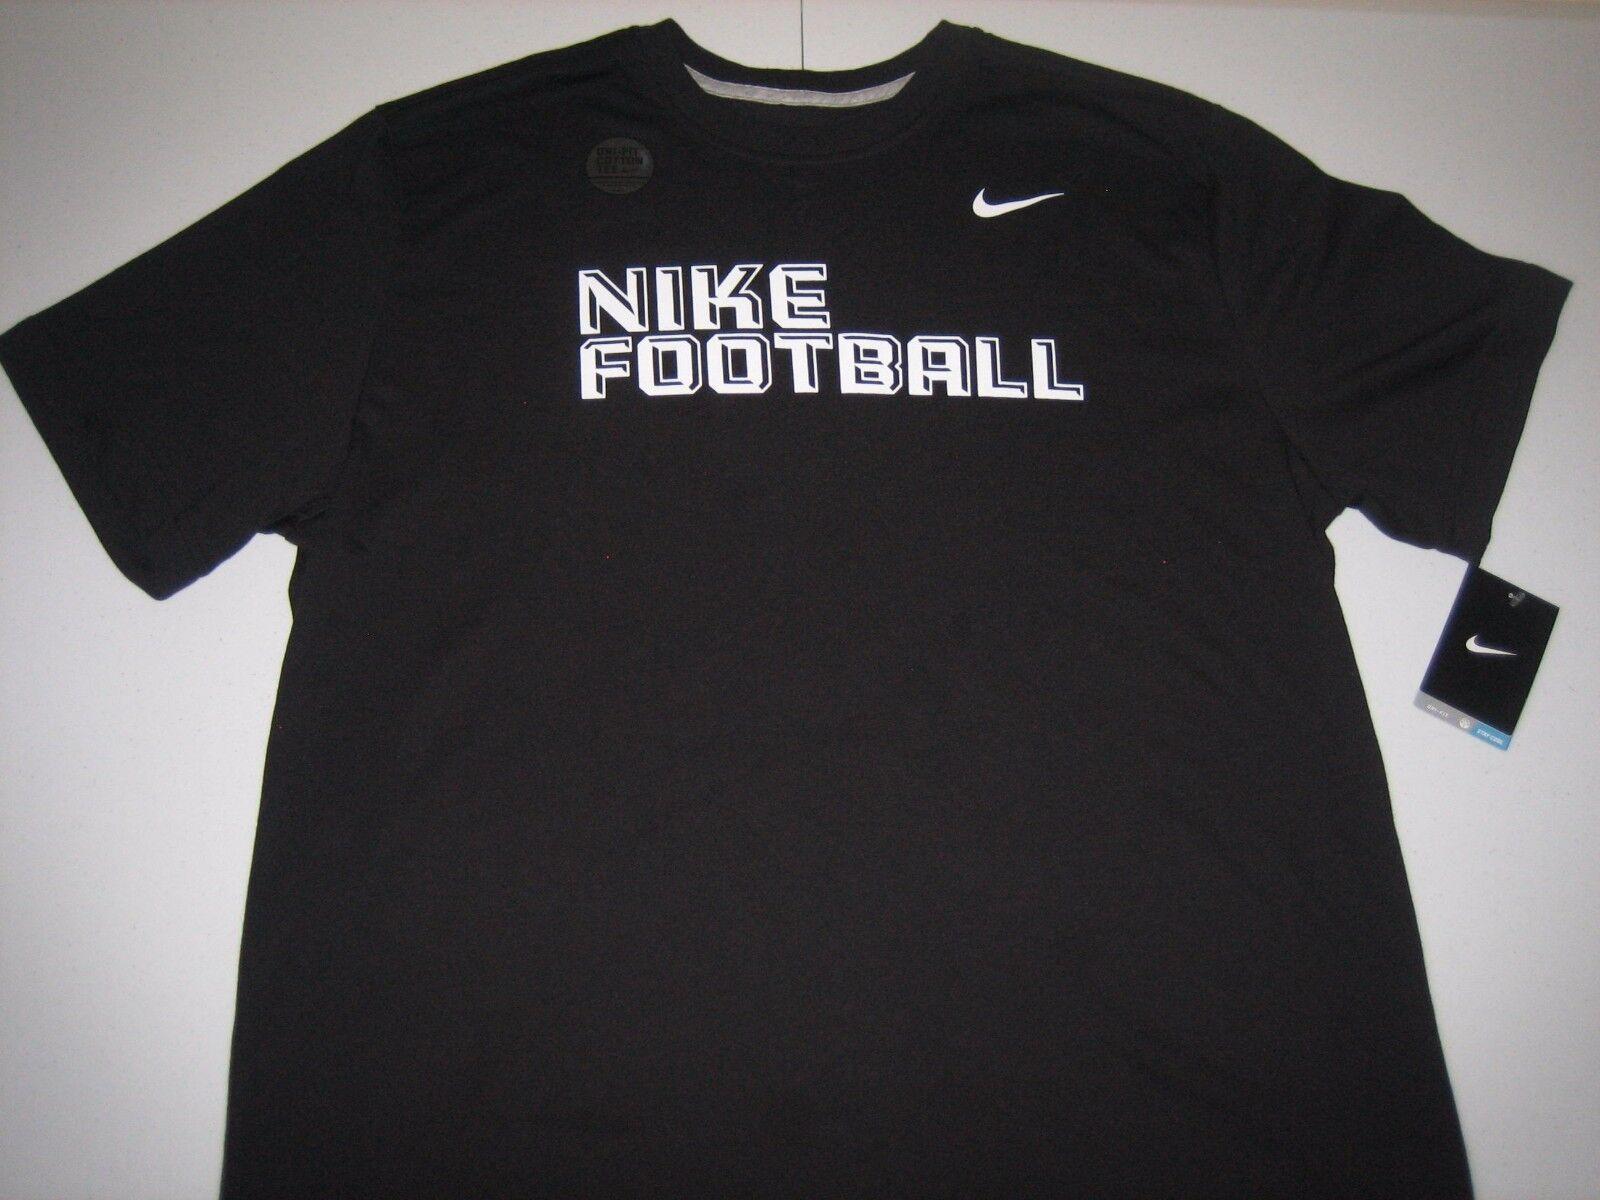 al menos Pepino S t  Nike Football Dri-Fit Performance T-Shirt Black/White Men's XL BNWT! for  sale online